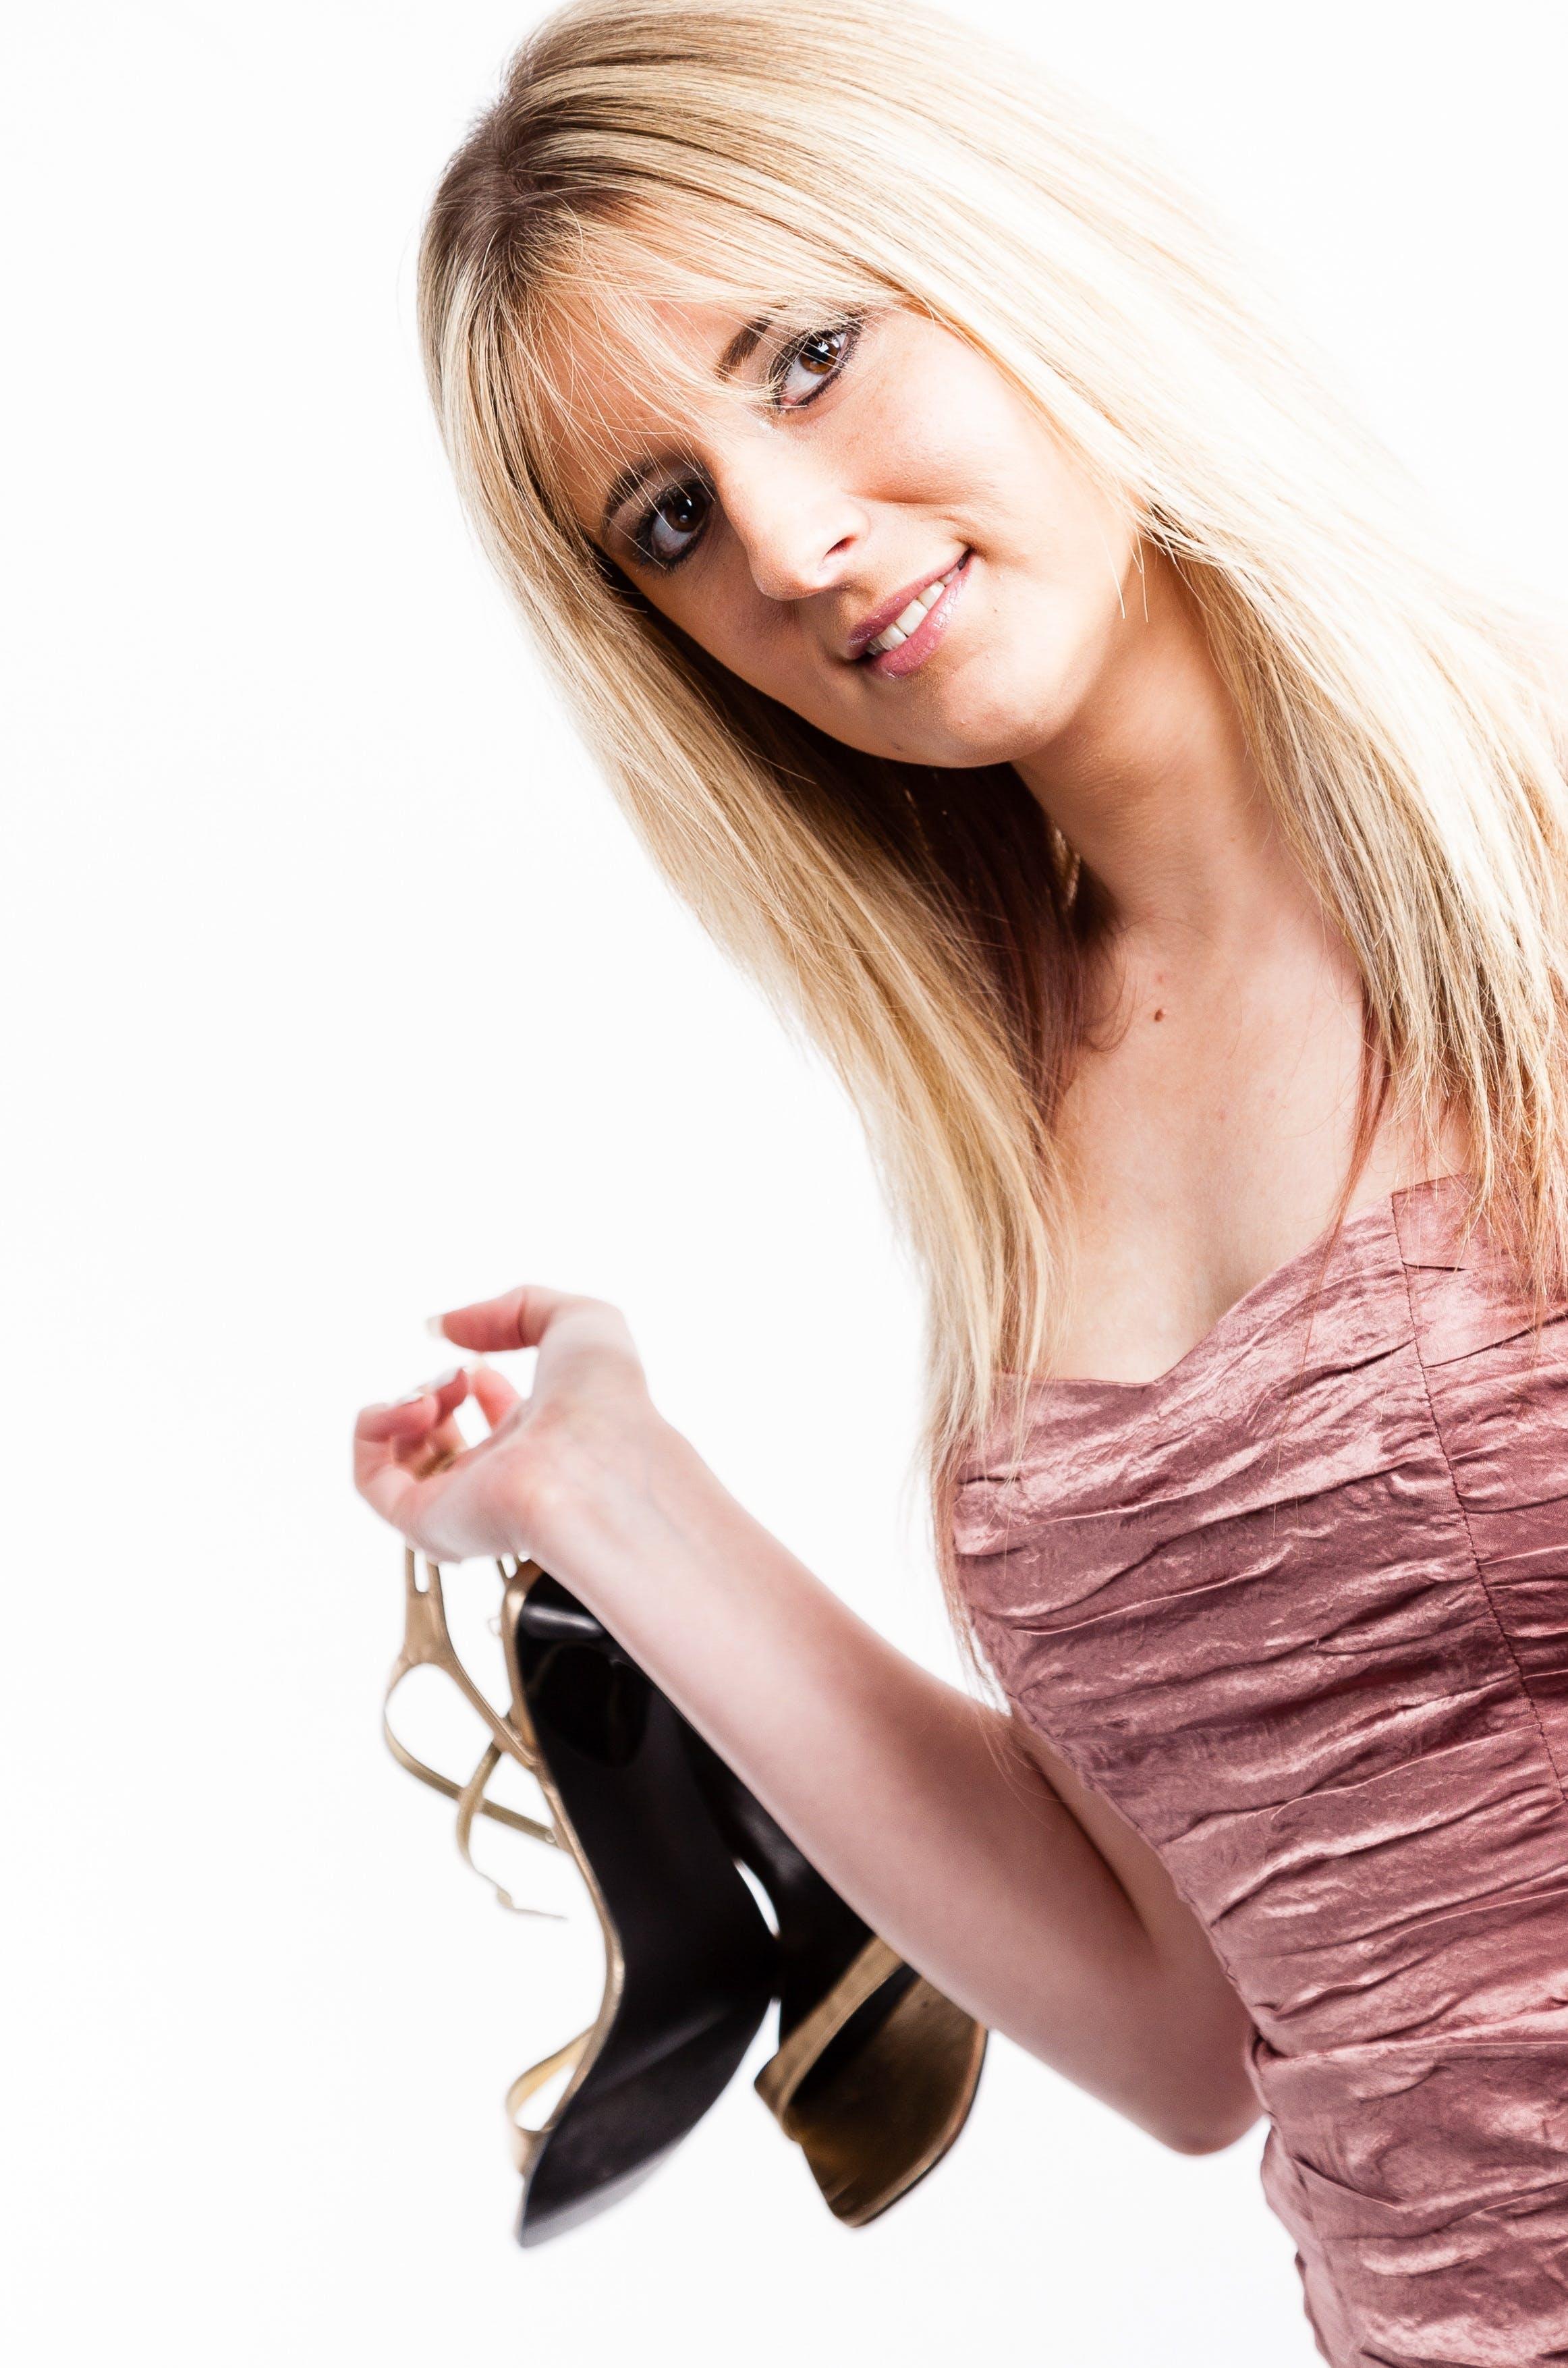 Free stock photo of fashion, woman, girl, party